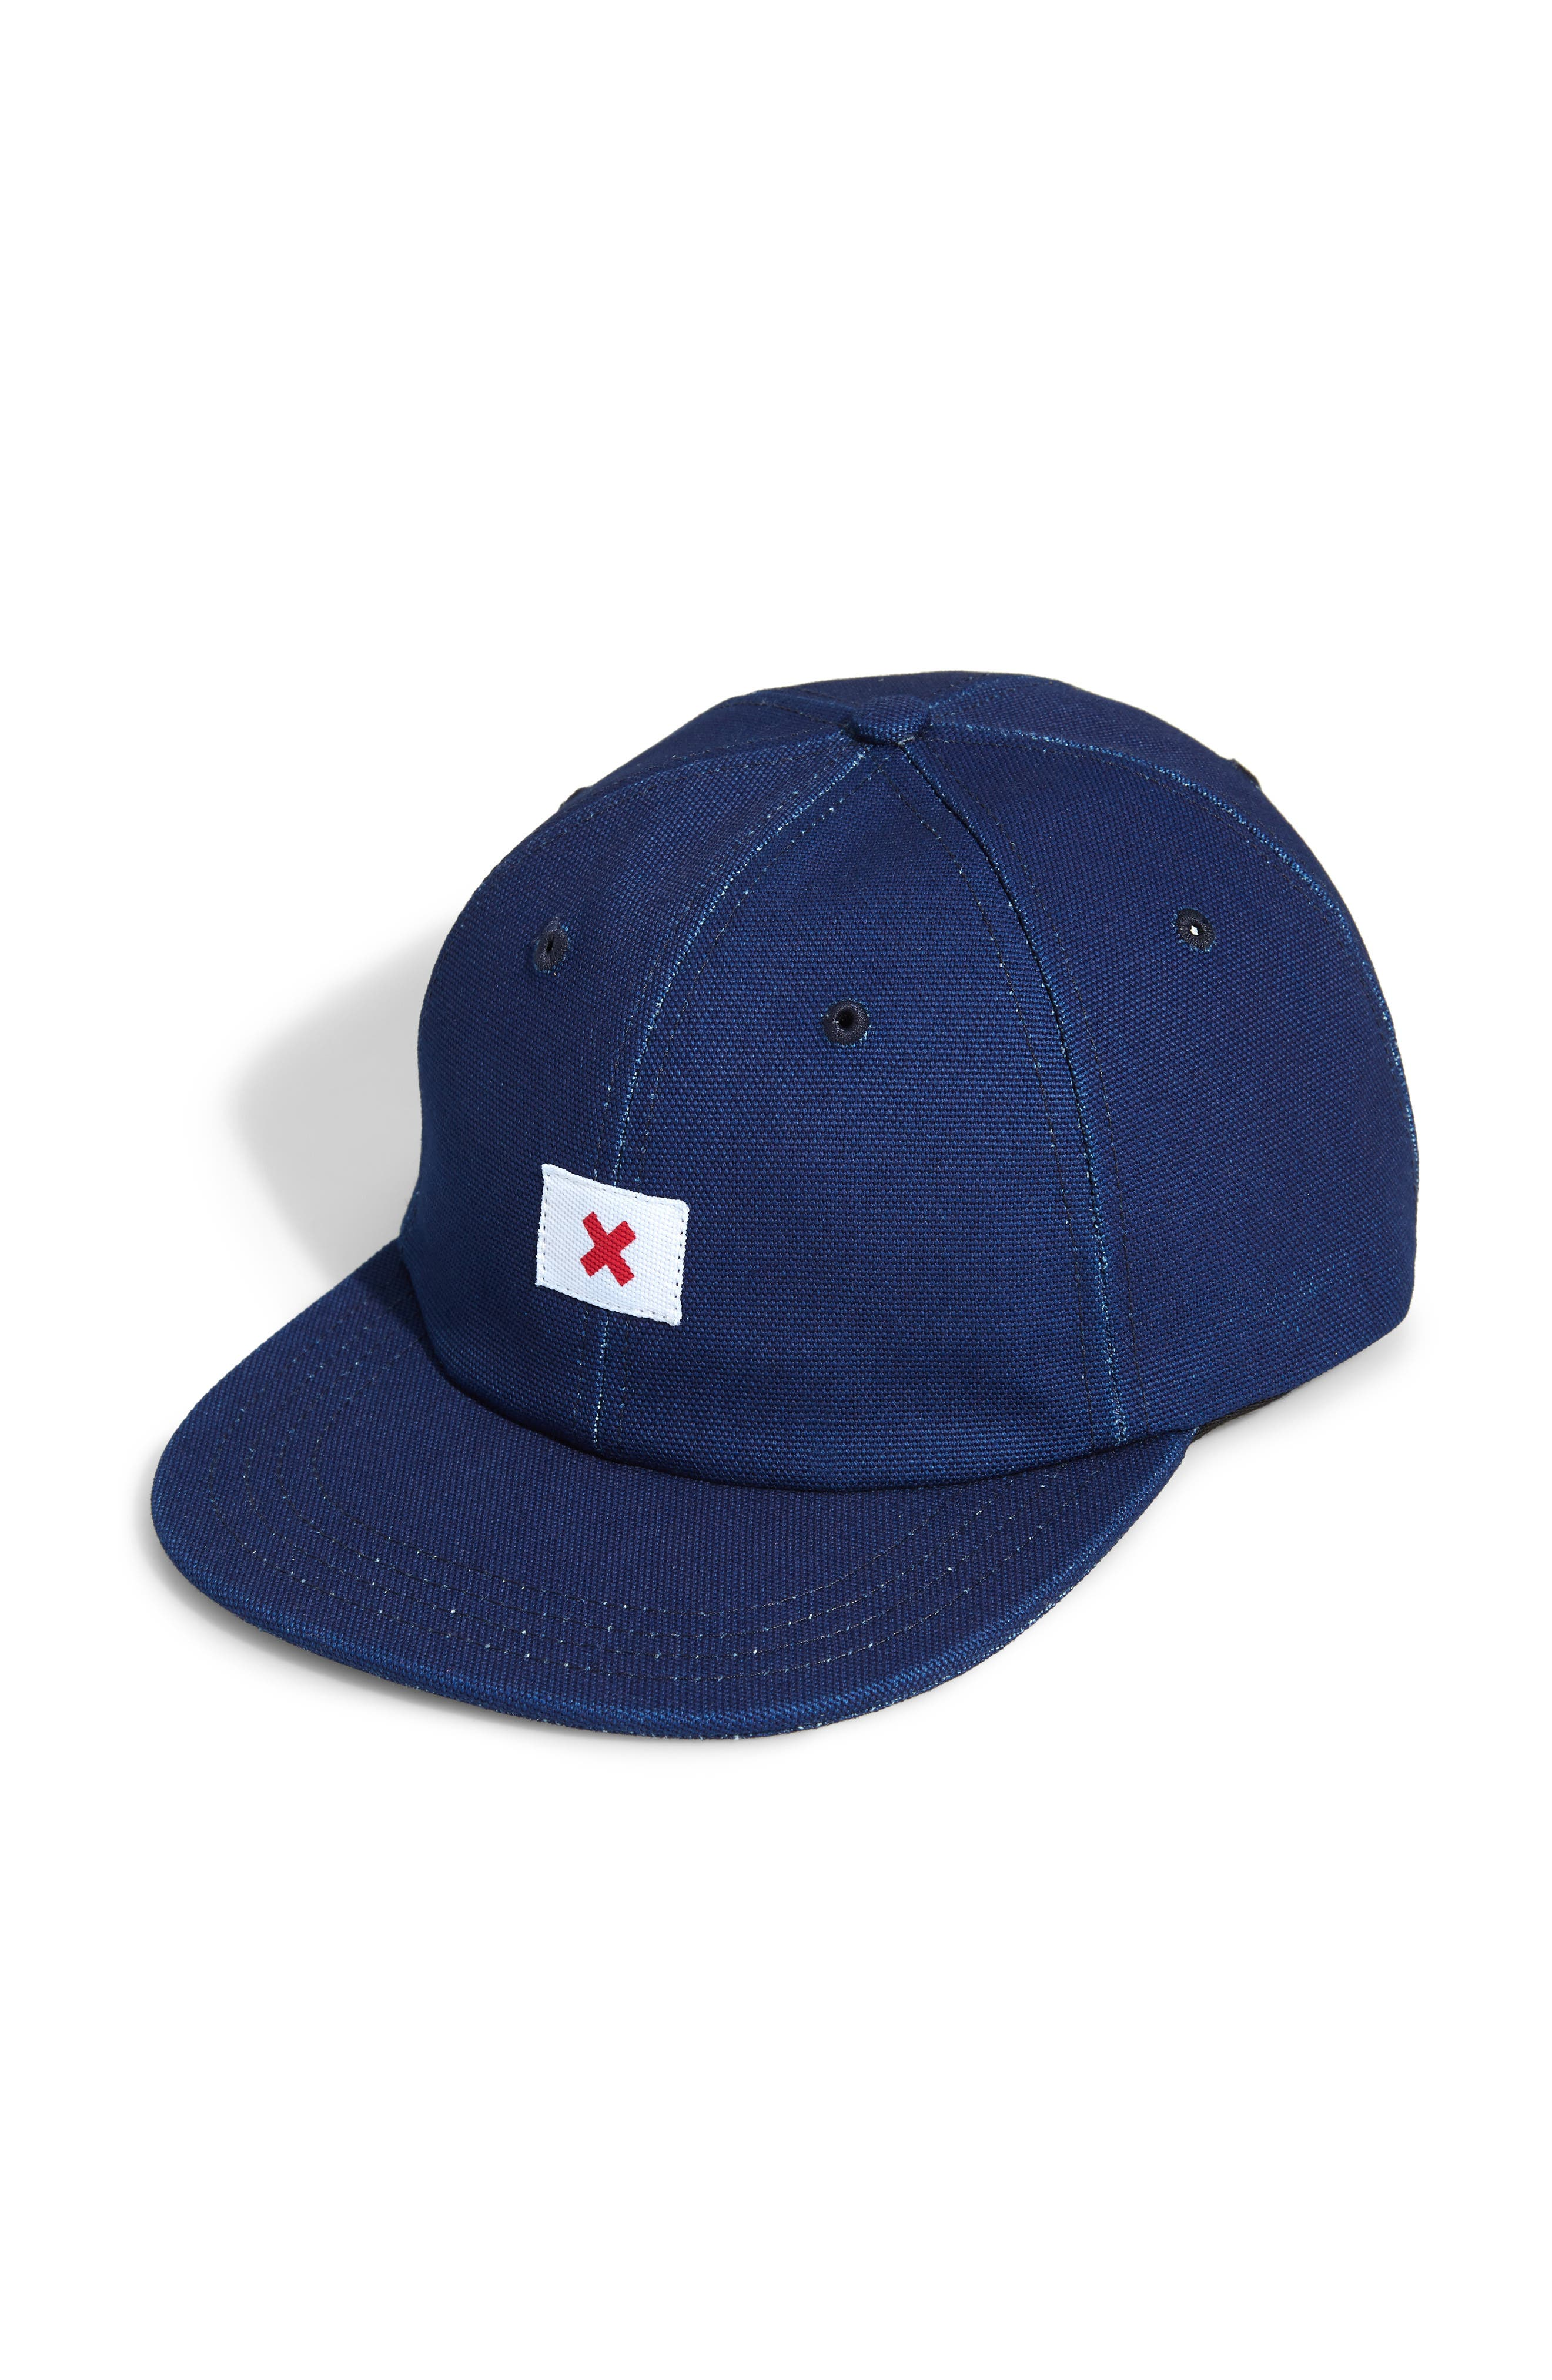 Kojima Canvas Baseball Cap,                             Main thumbnail 1, color,                             INDIGO